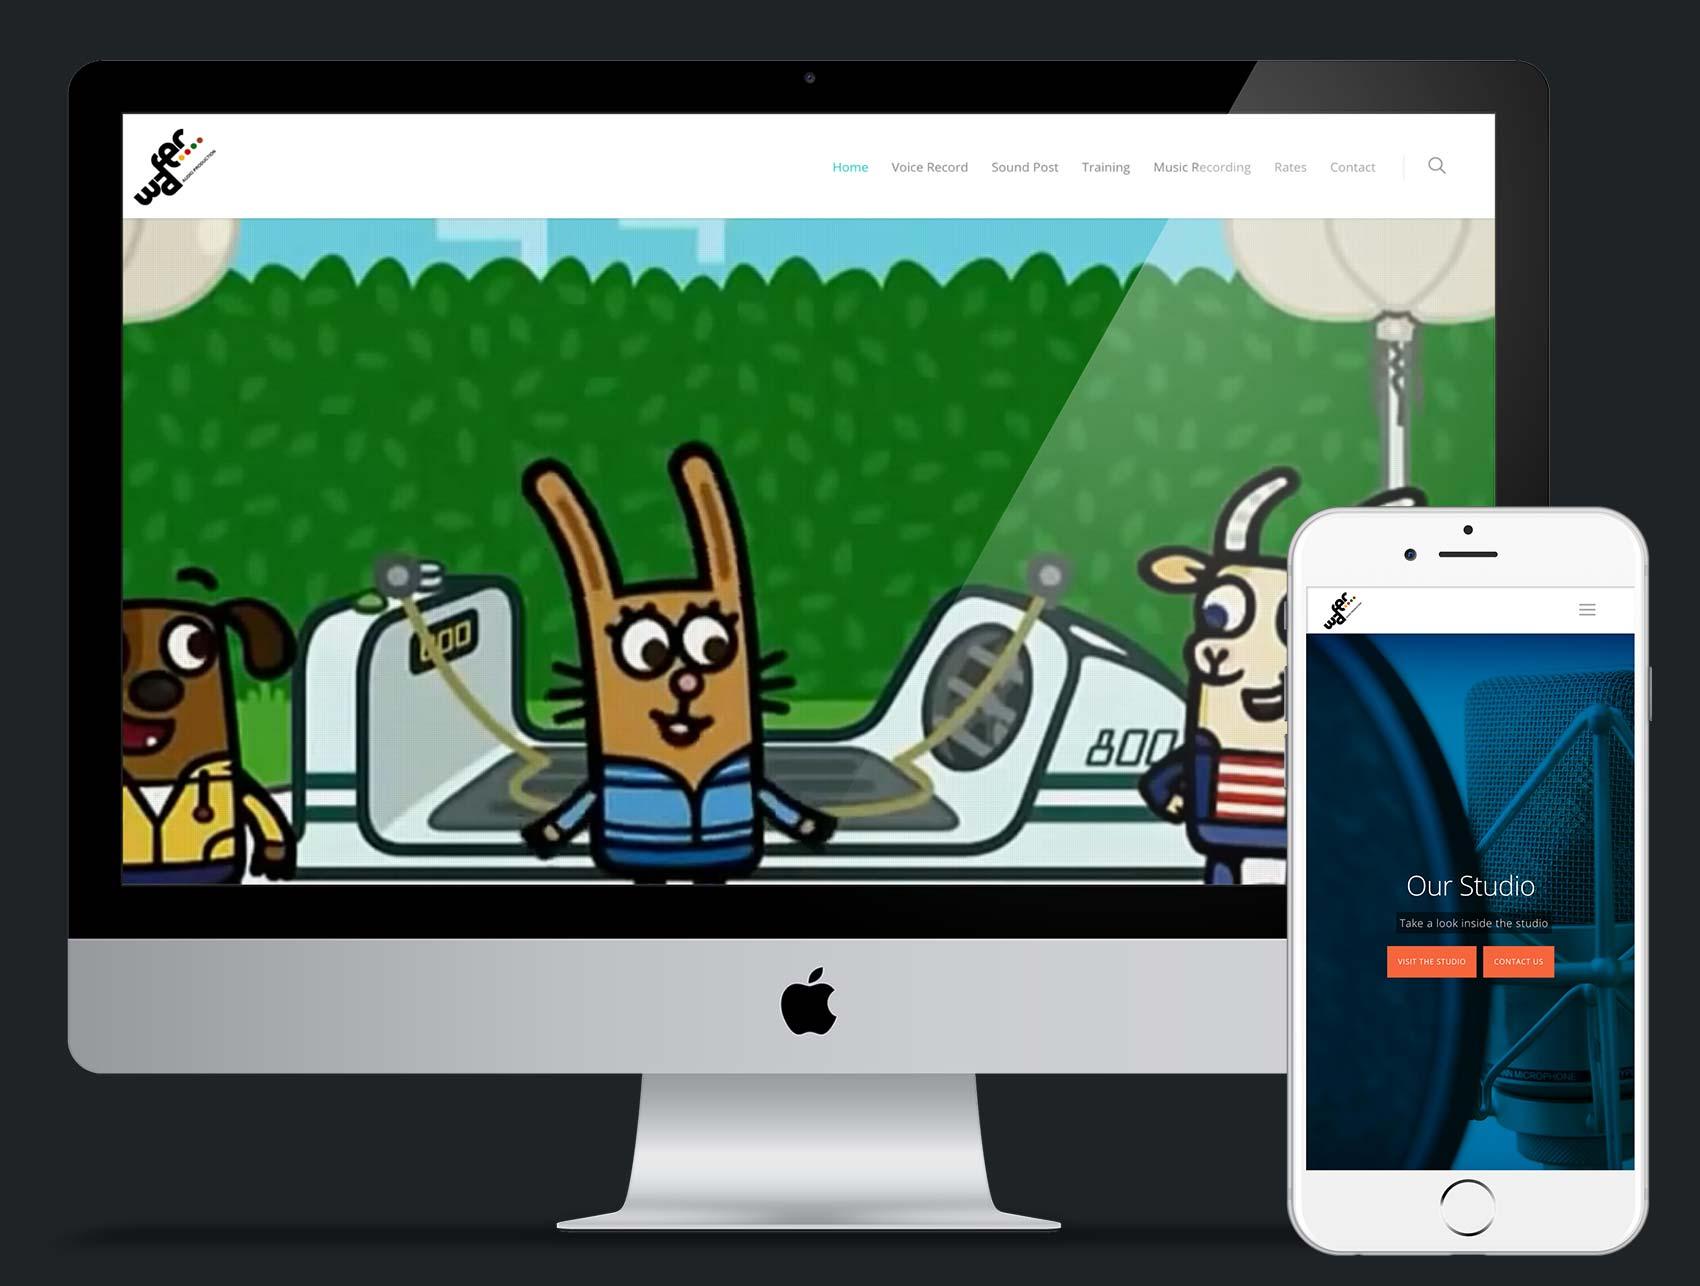 Wafer Audio website design and build using Wordpress